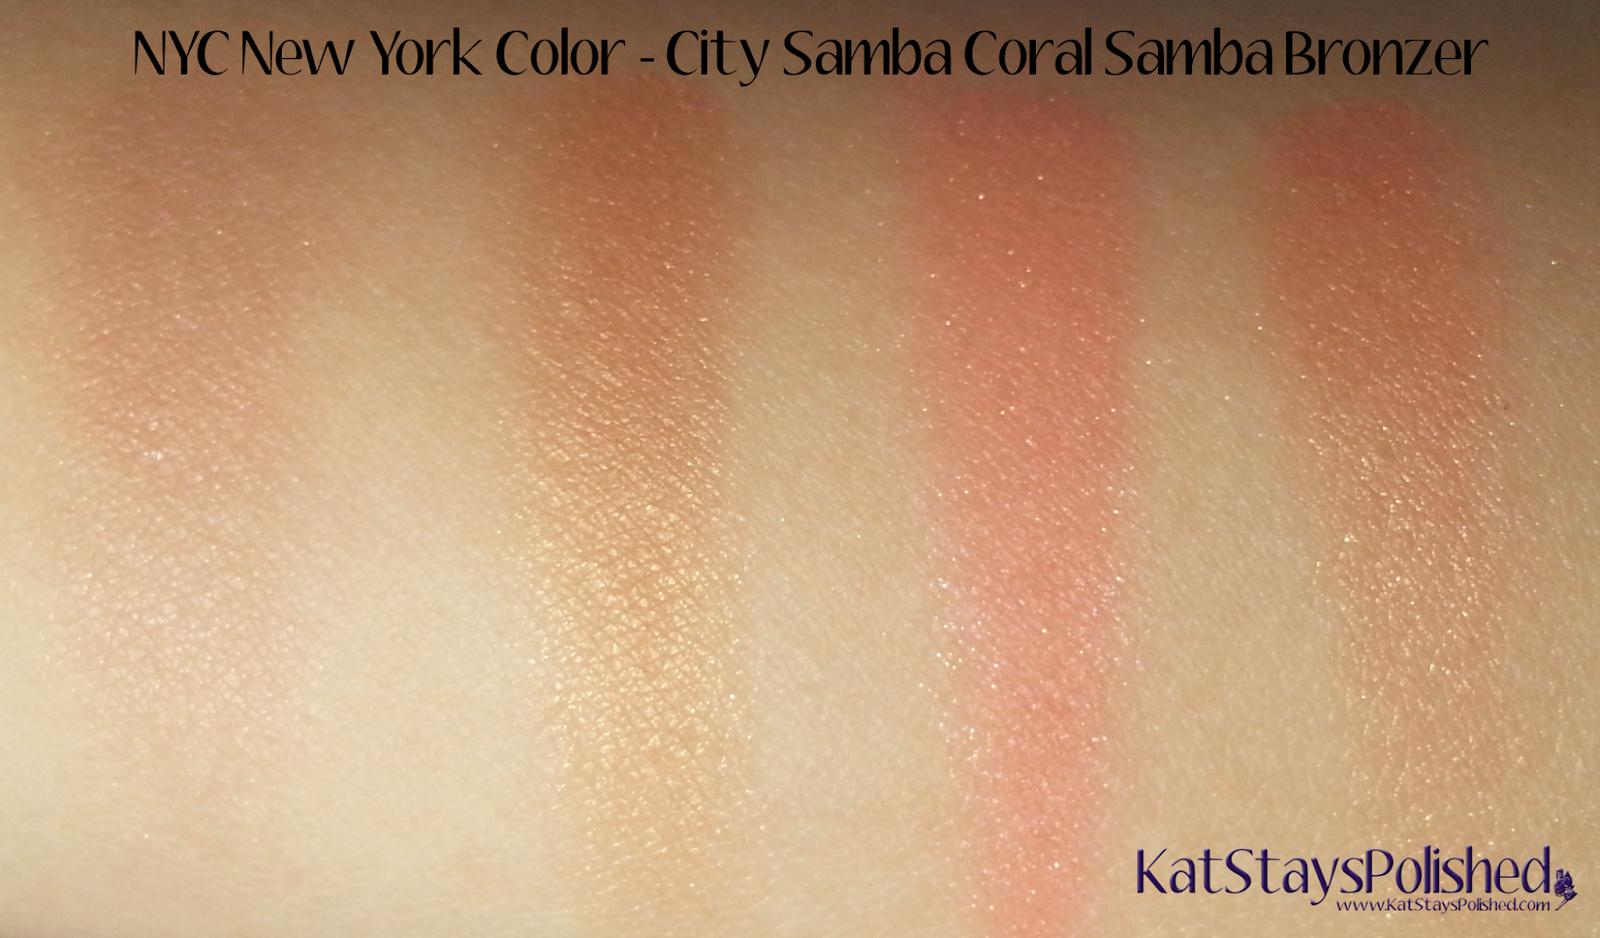 NYC New York Color - City Samba Sun 'n' Bronze - Coral Samba Bronzer Swatches | Kat Stays Polished